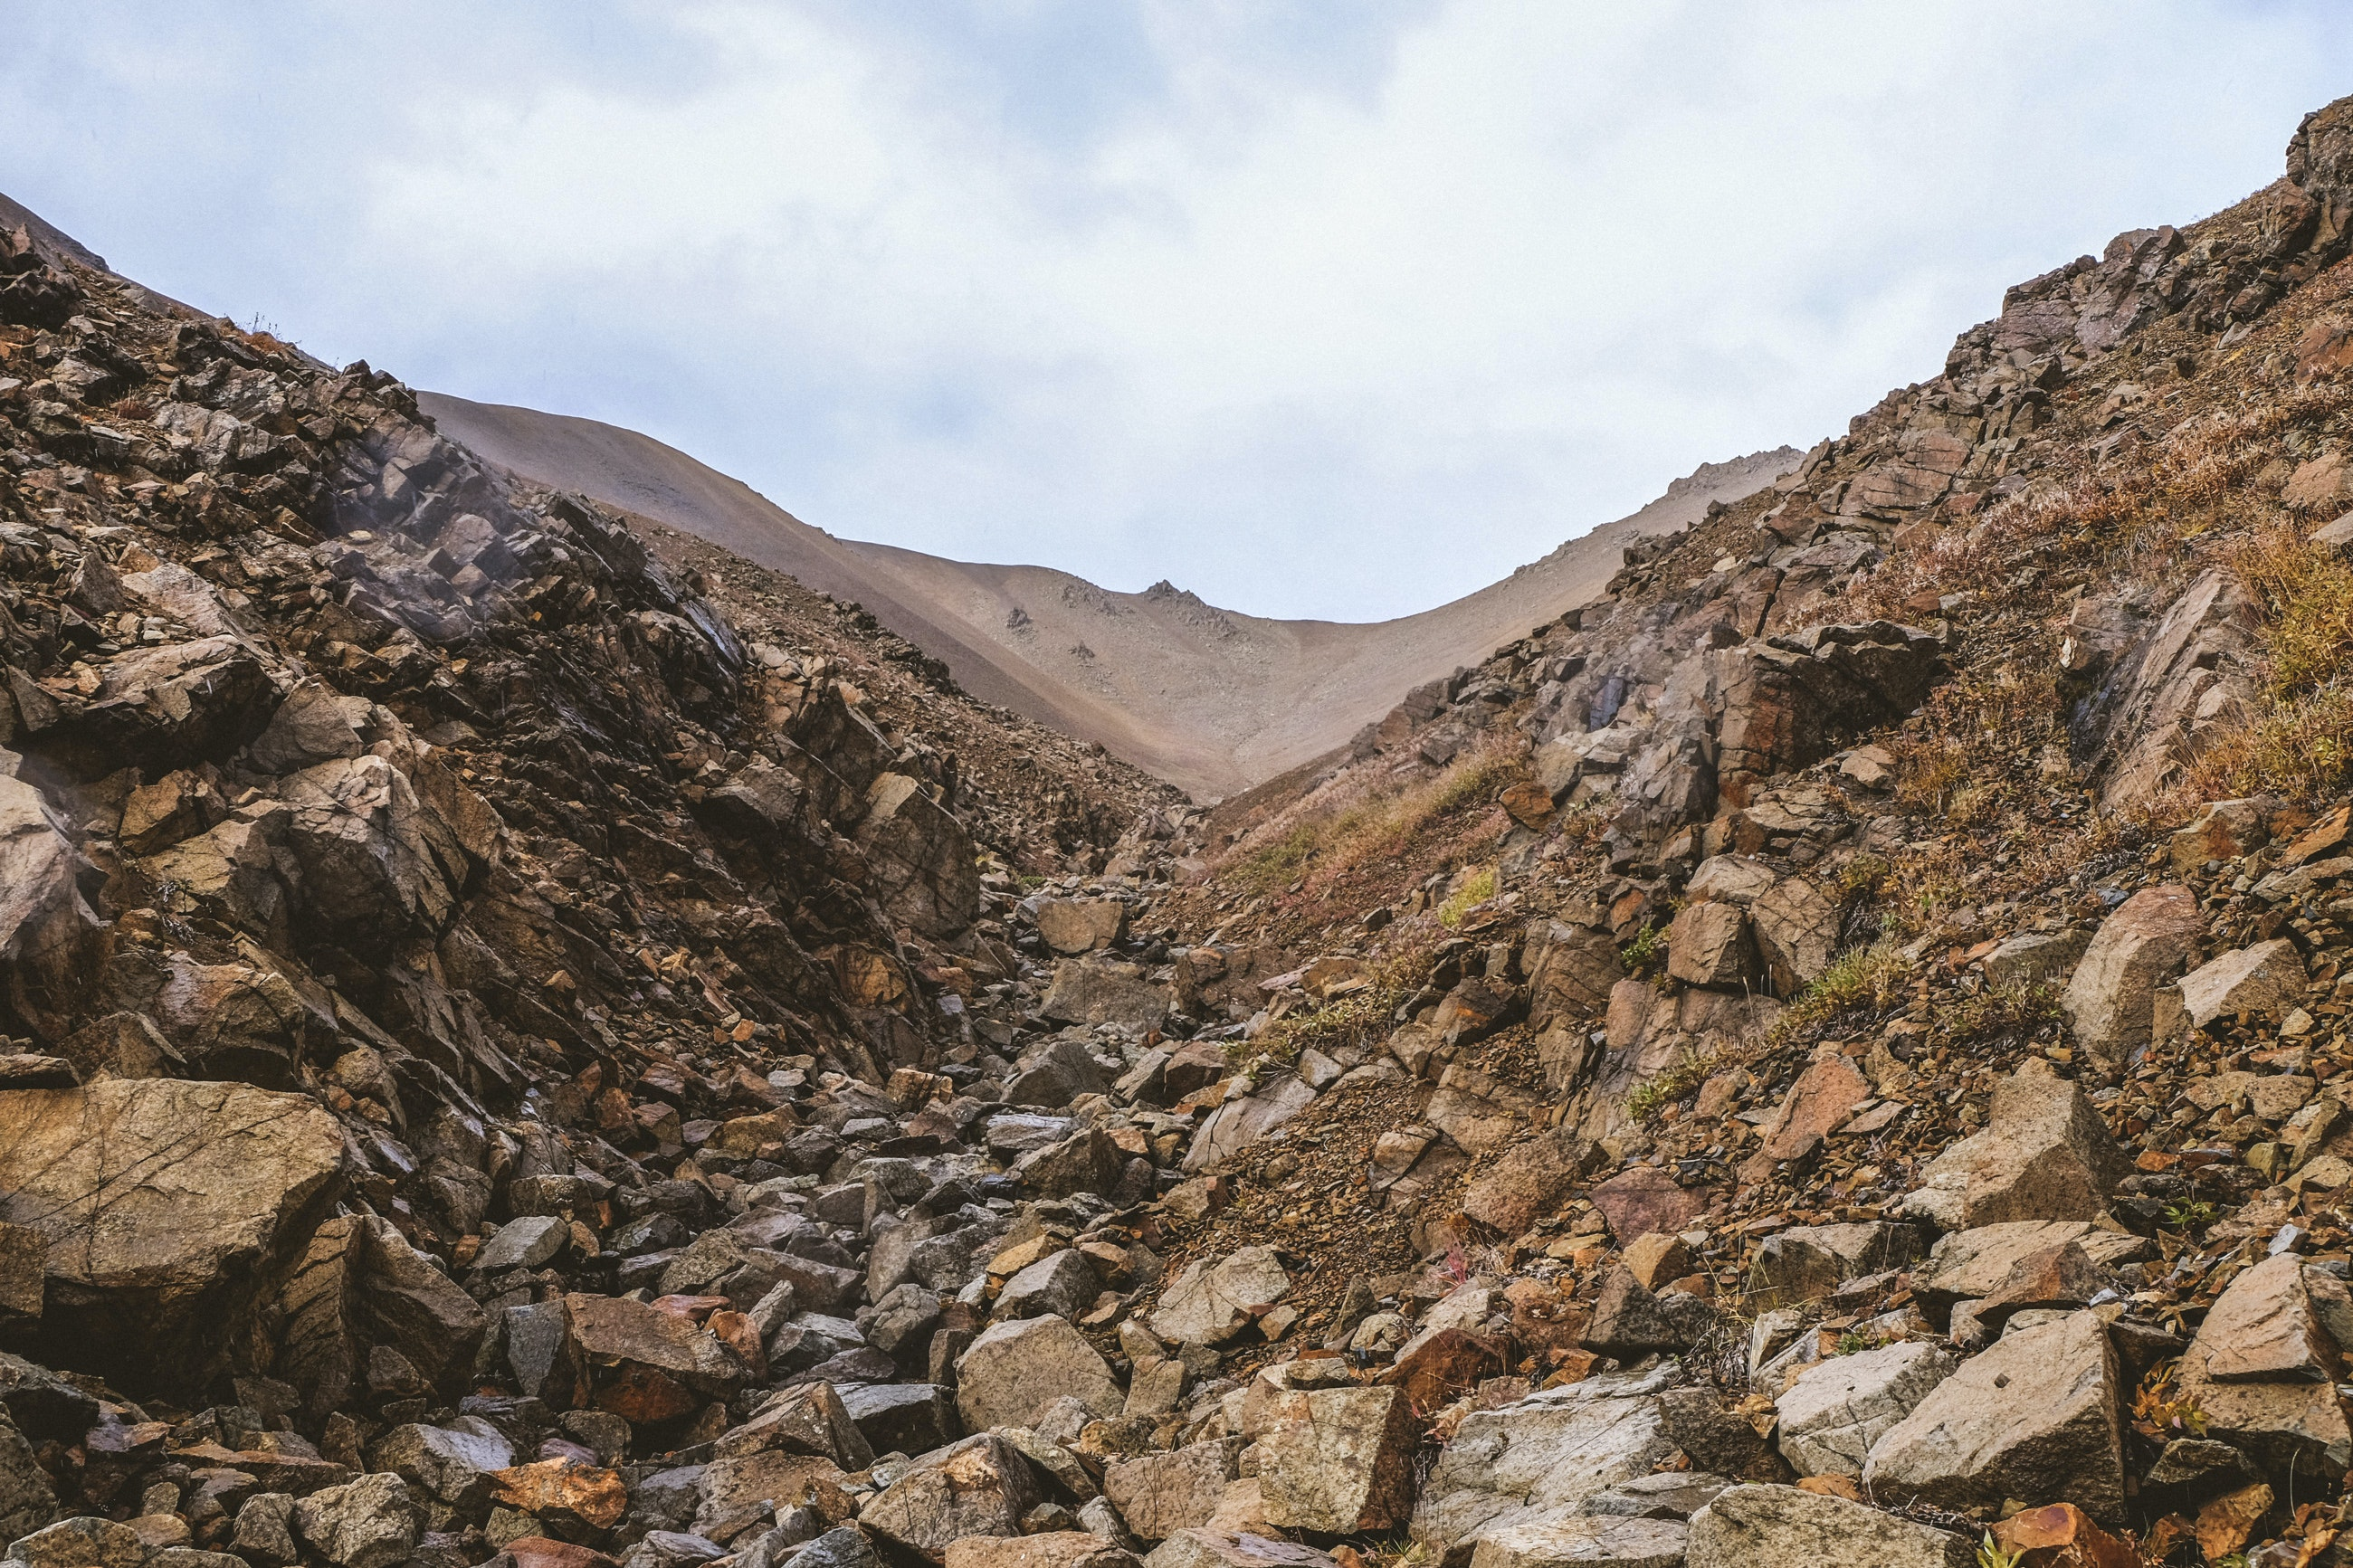 The ridge - Denali National Park